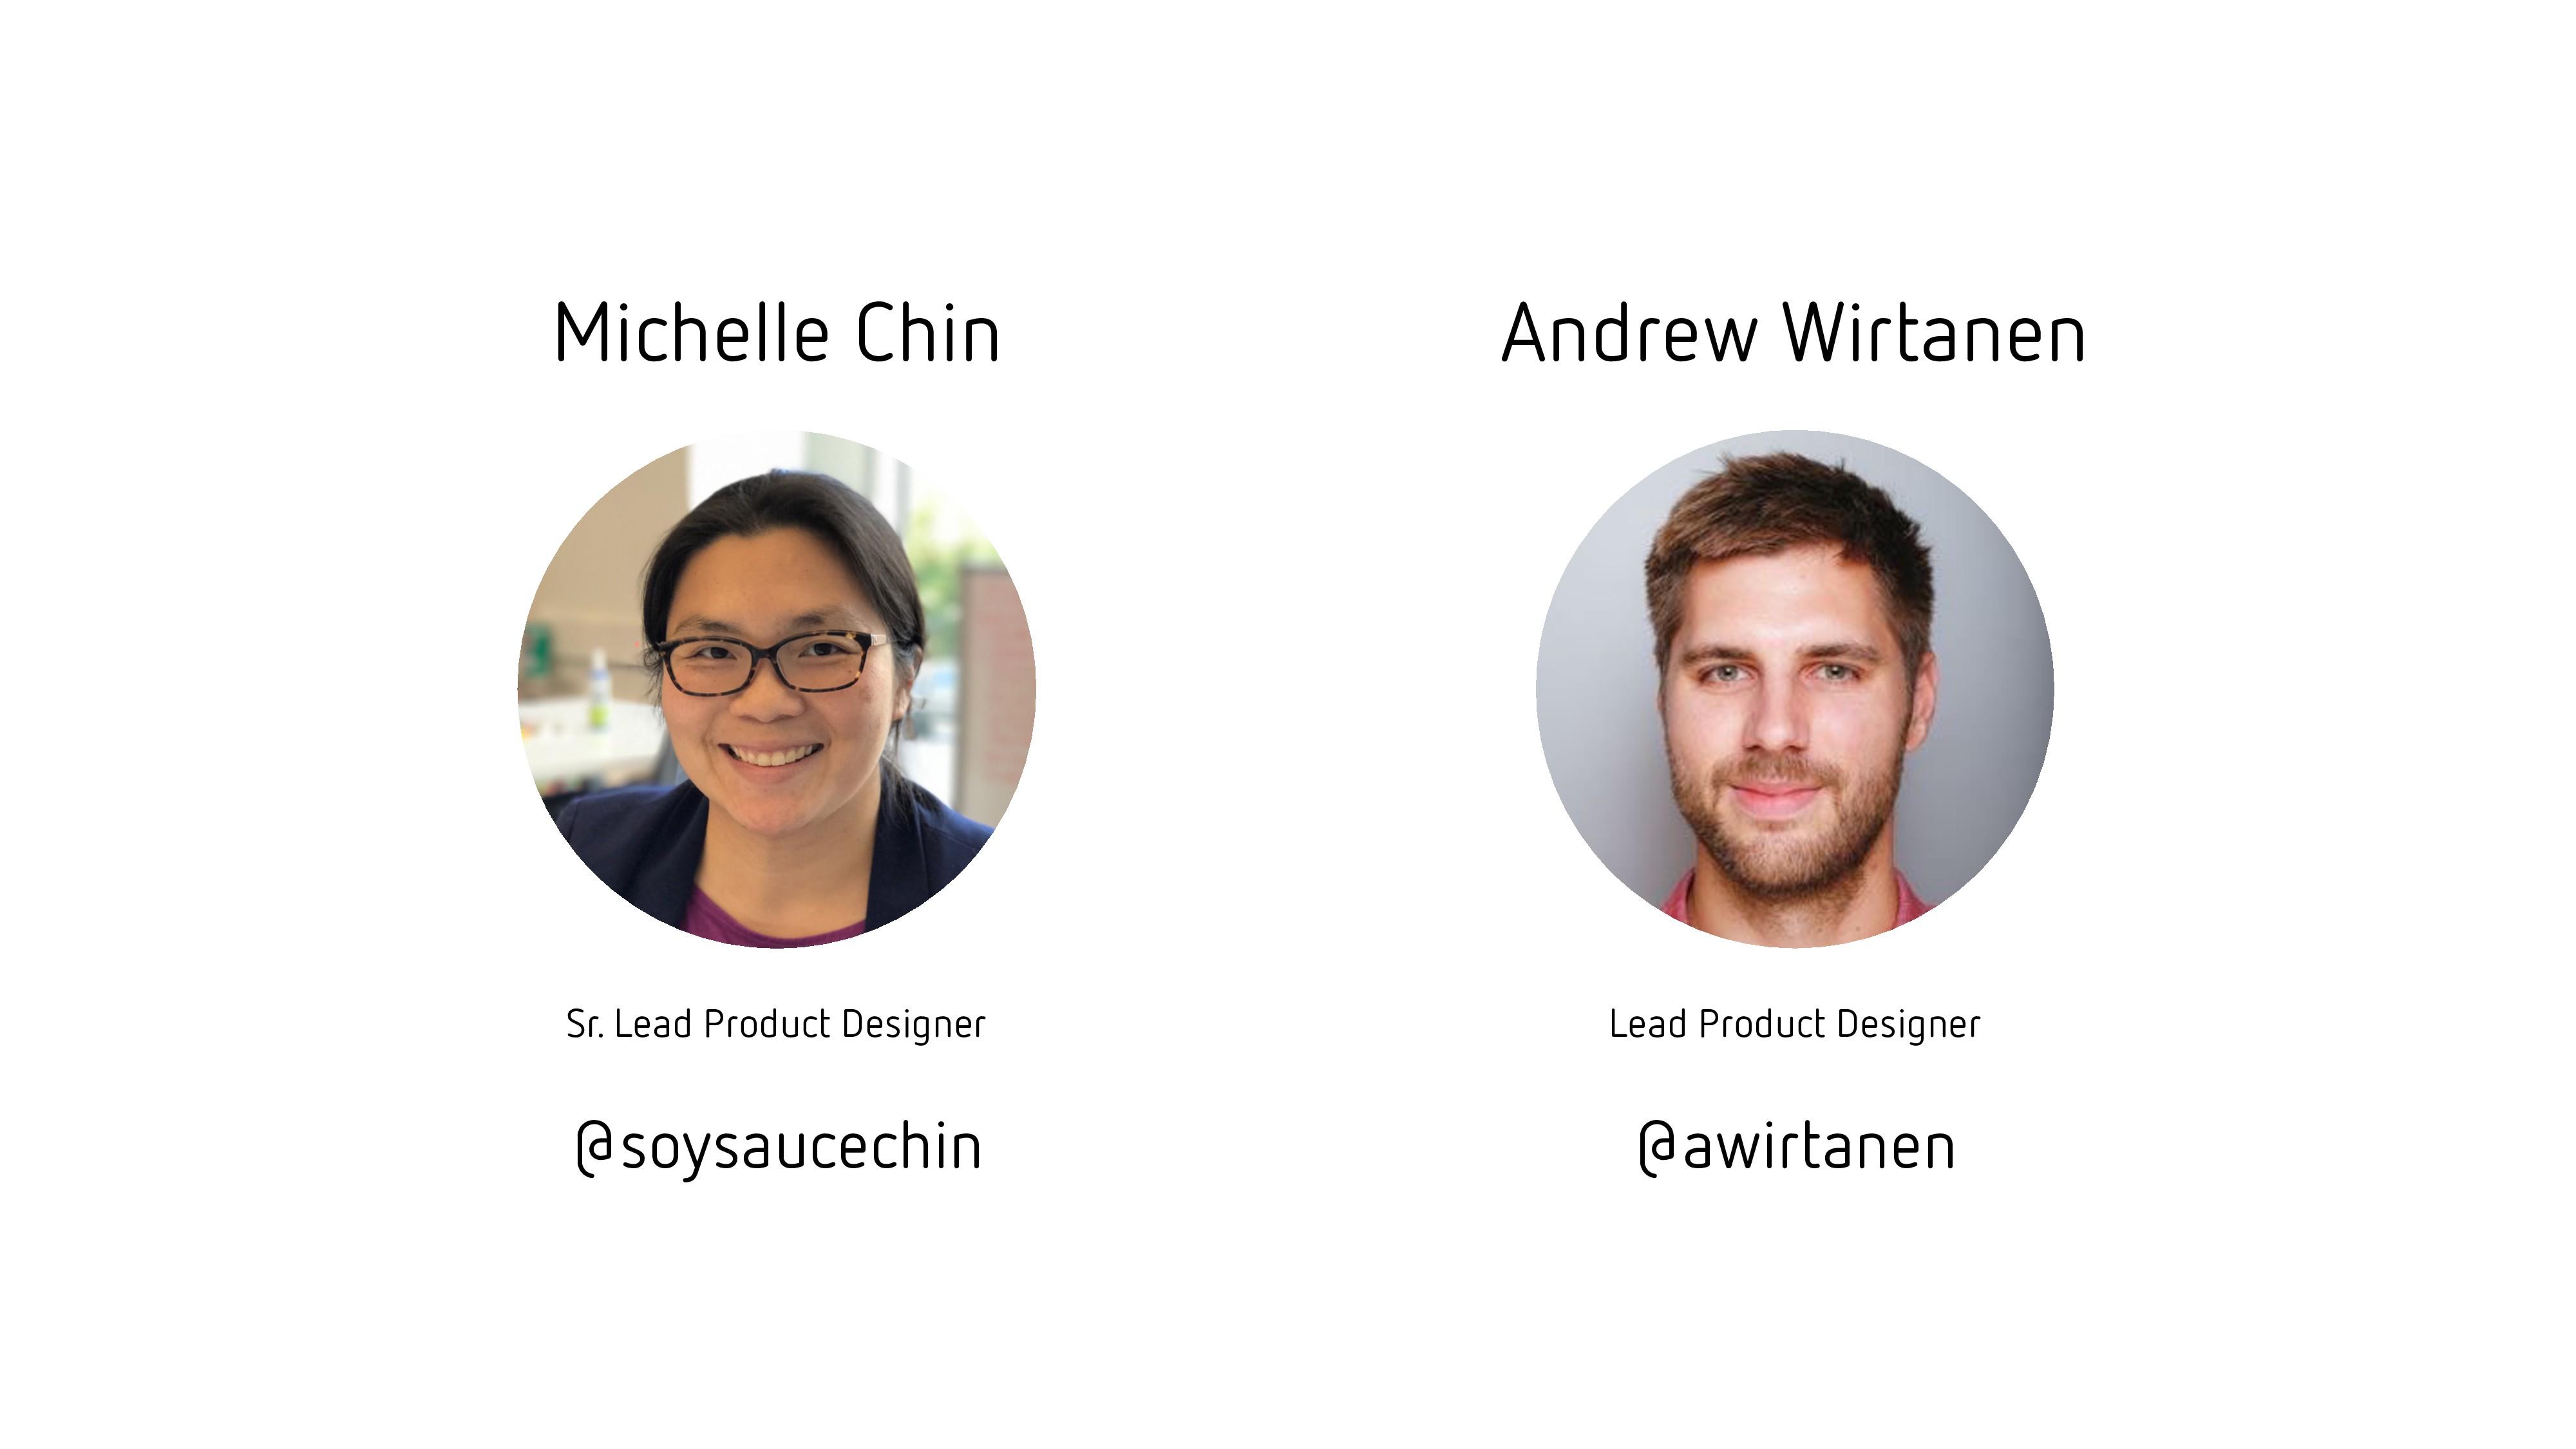 Andrew Wirtanen @awirtanen Lead Product Designe...